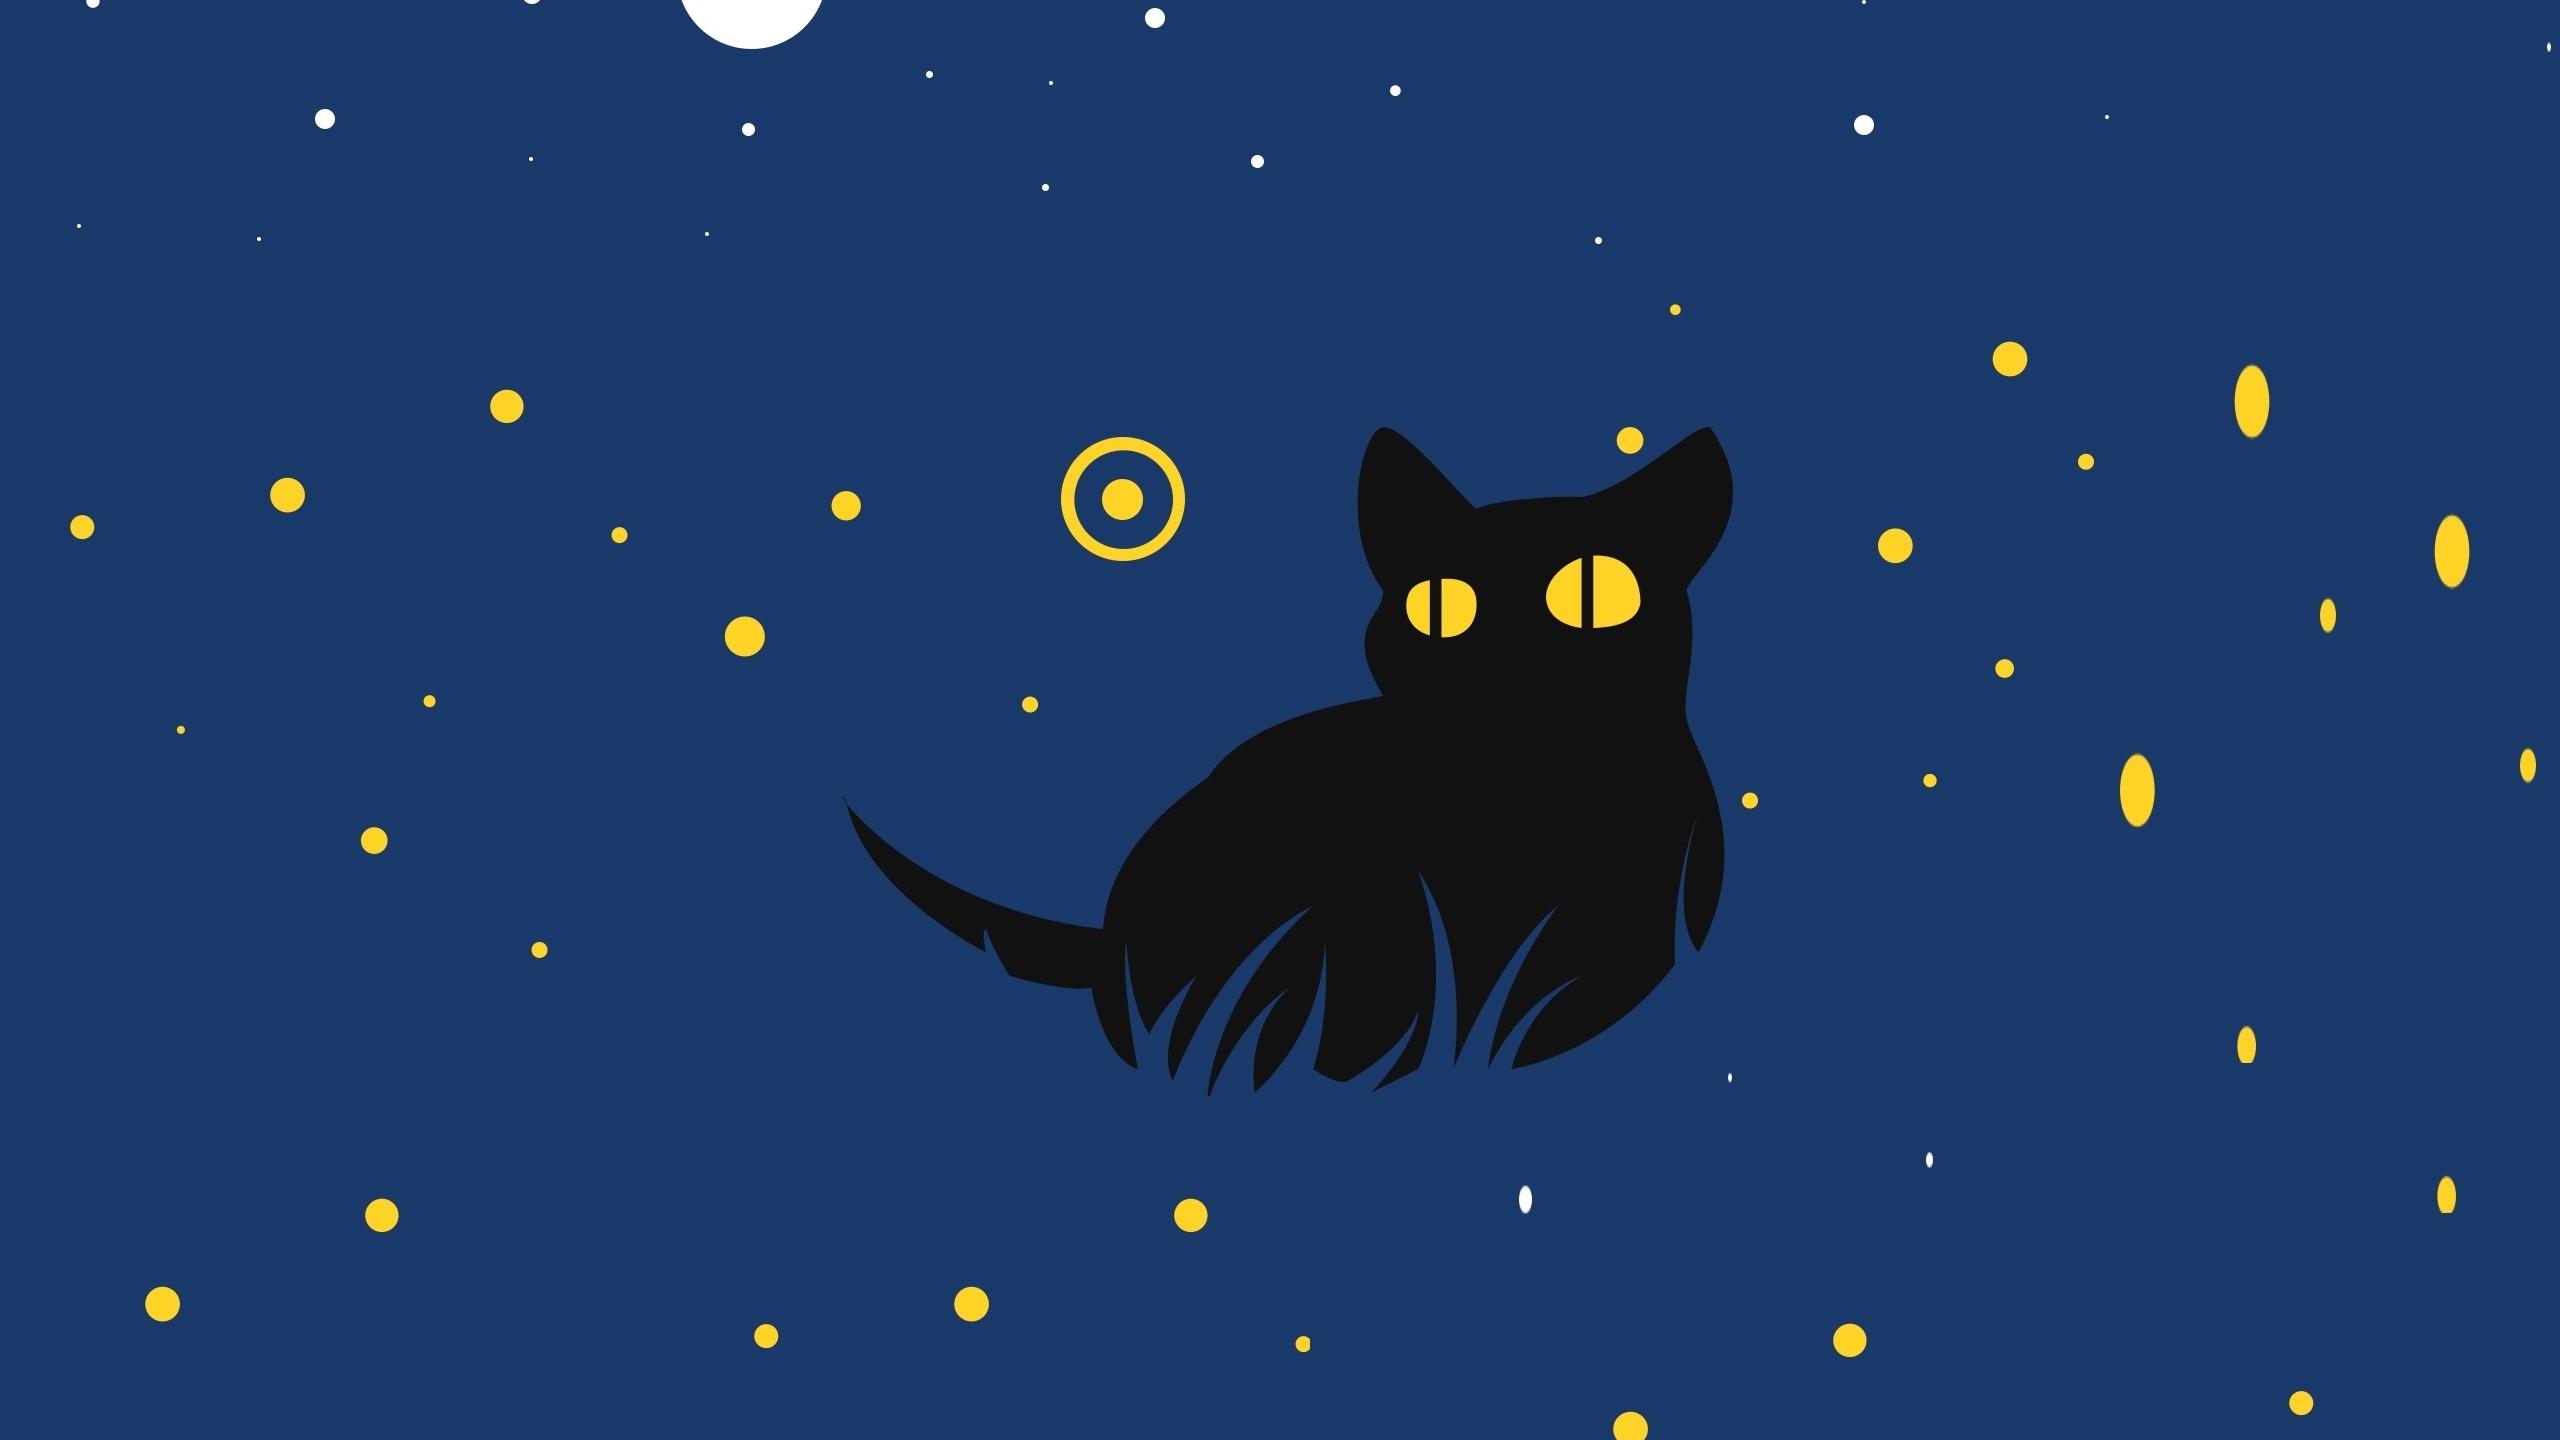 Download 2560x1440 Wallpaper Cute Black Cat Minimal Art Dual Wide Widescreen 16 9 Widescreen 2560x1440 Hd Image Background 15825